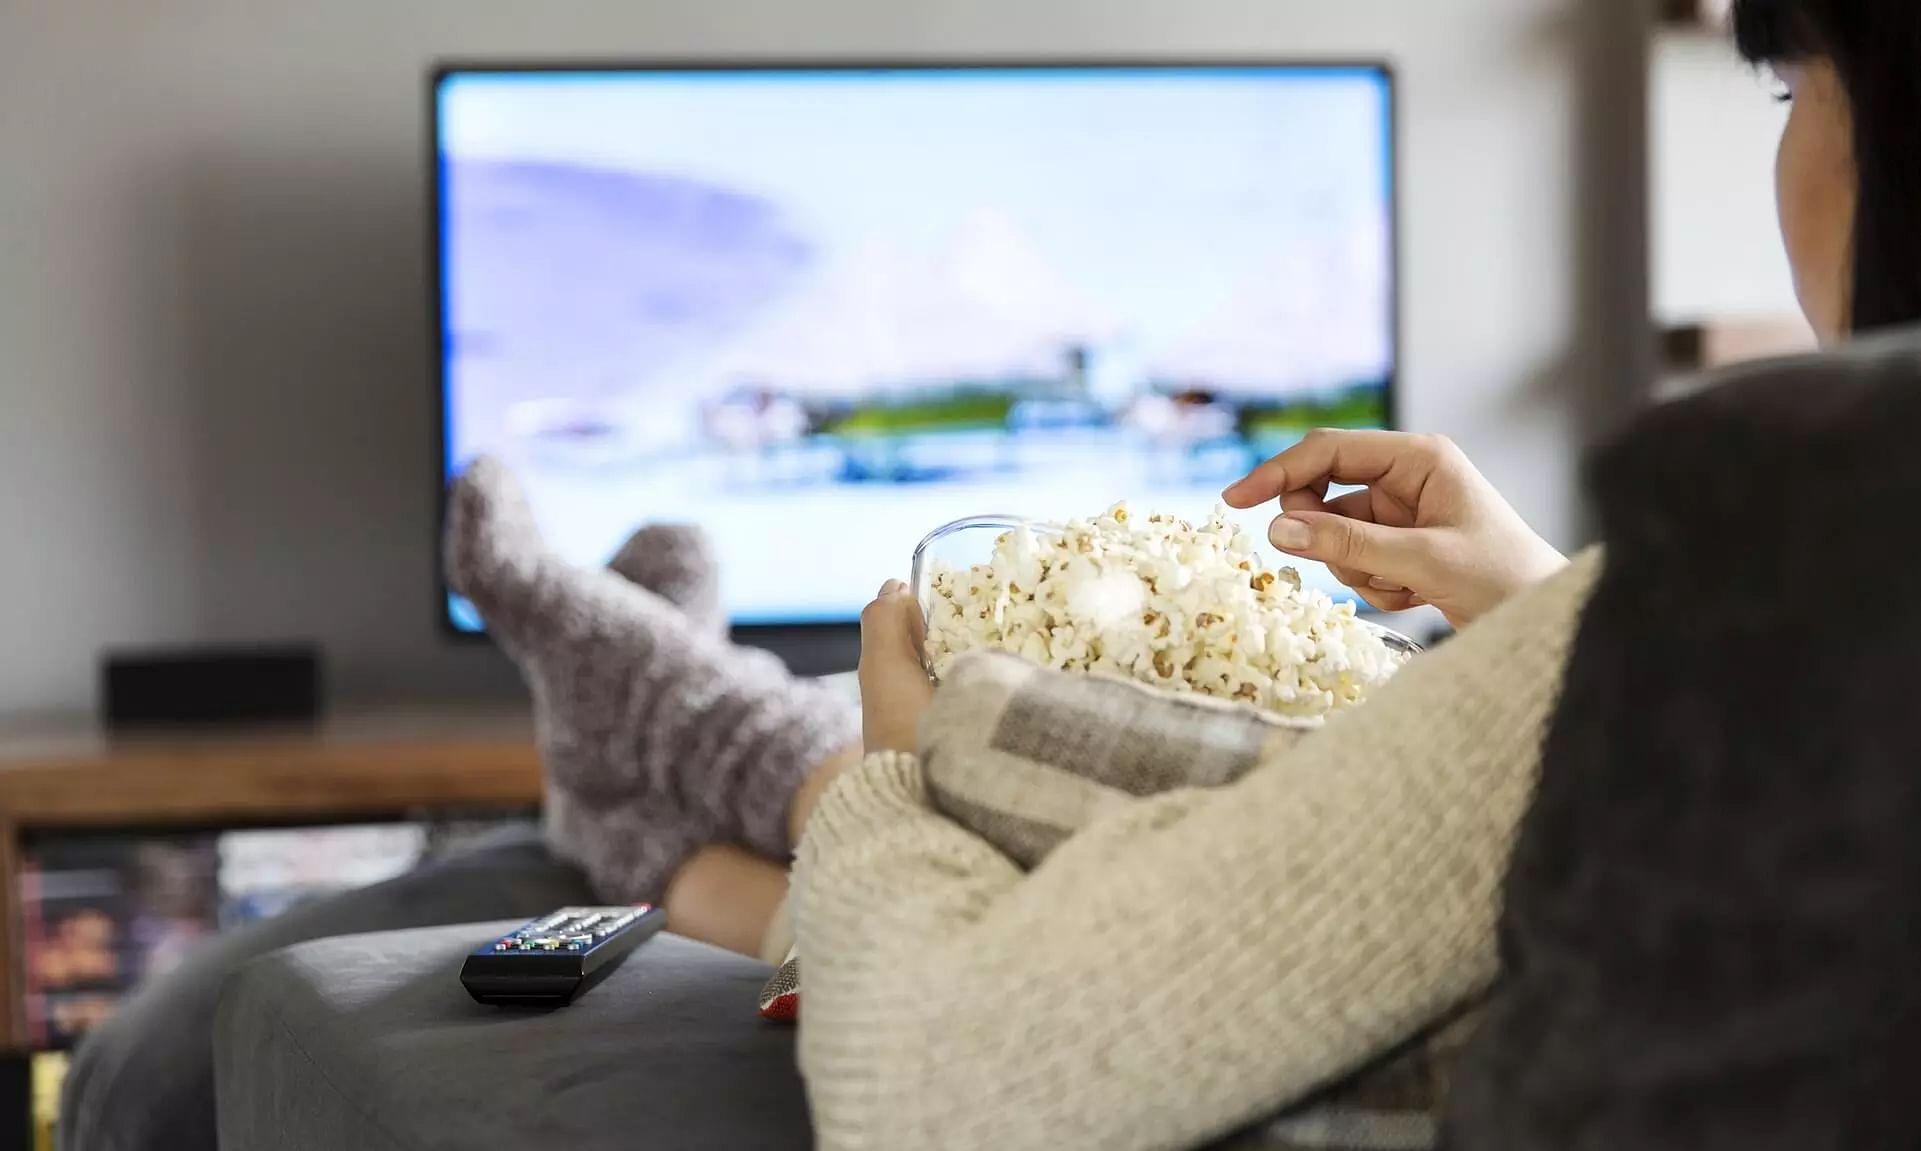 Top 10 South Korean Dramas You Should Watch in 2021